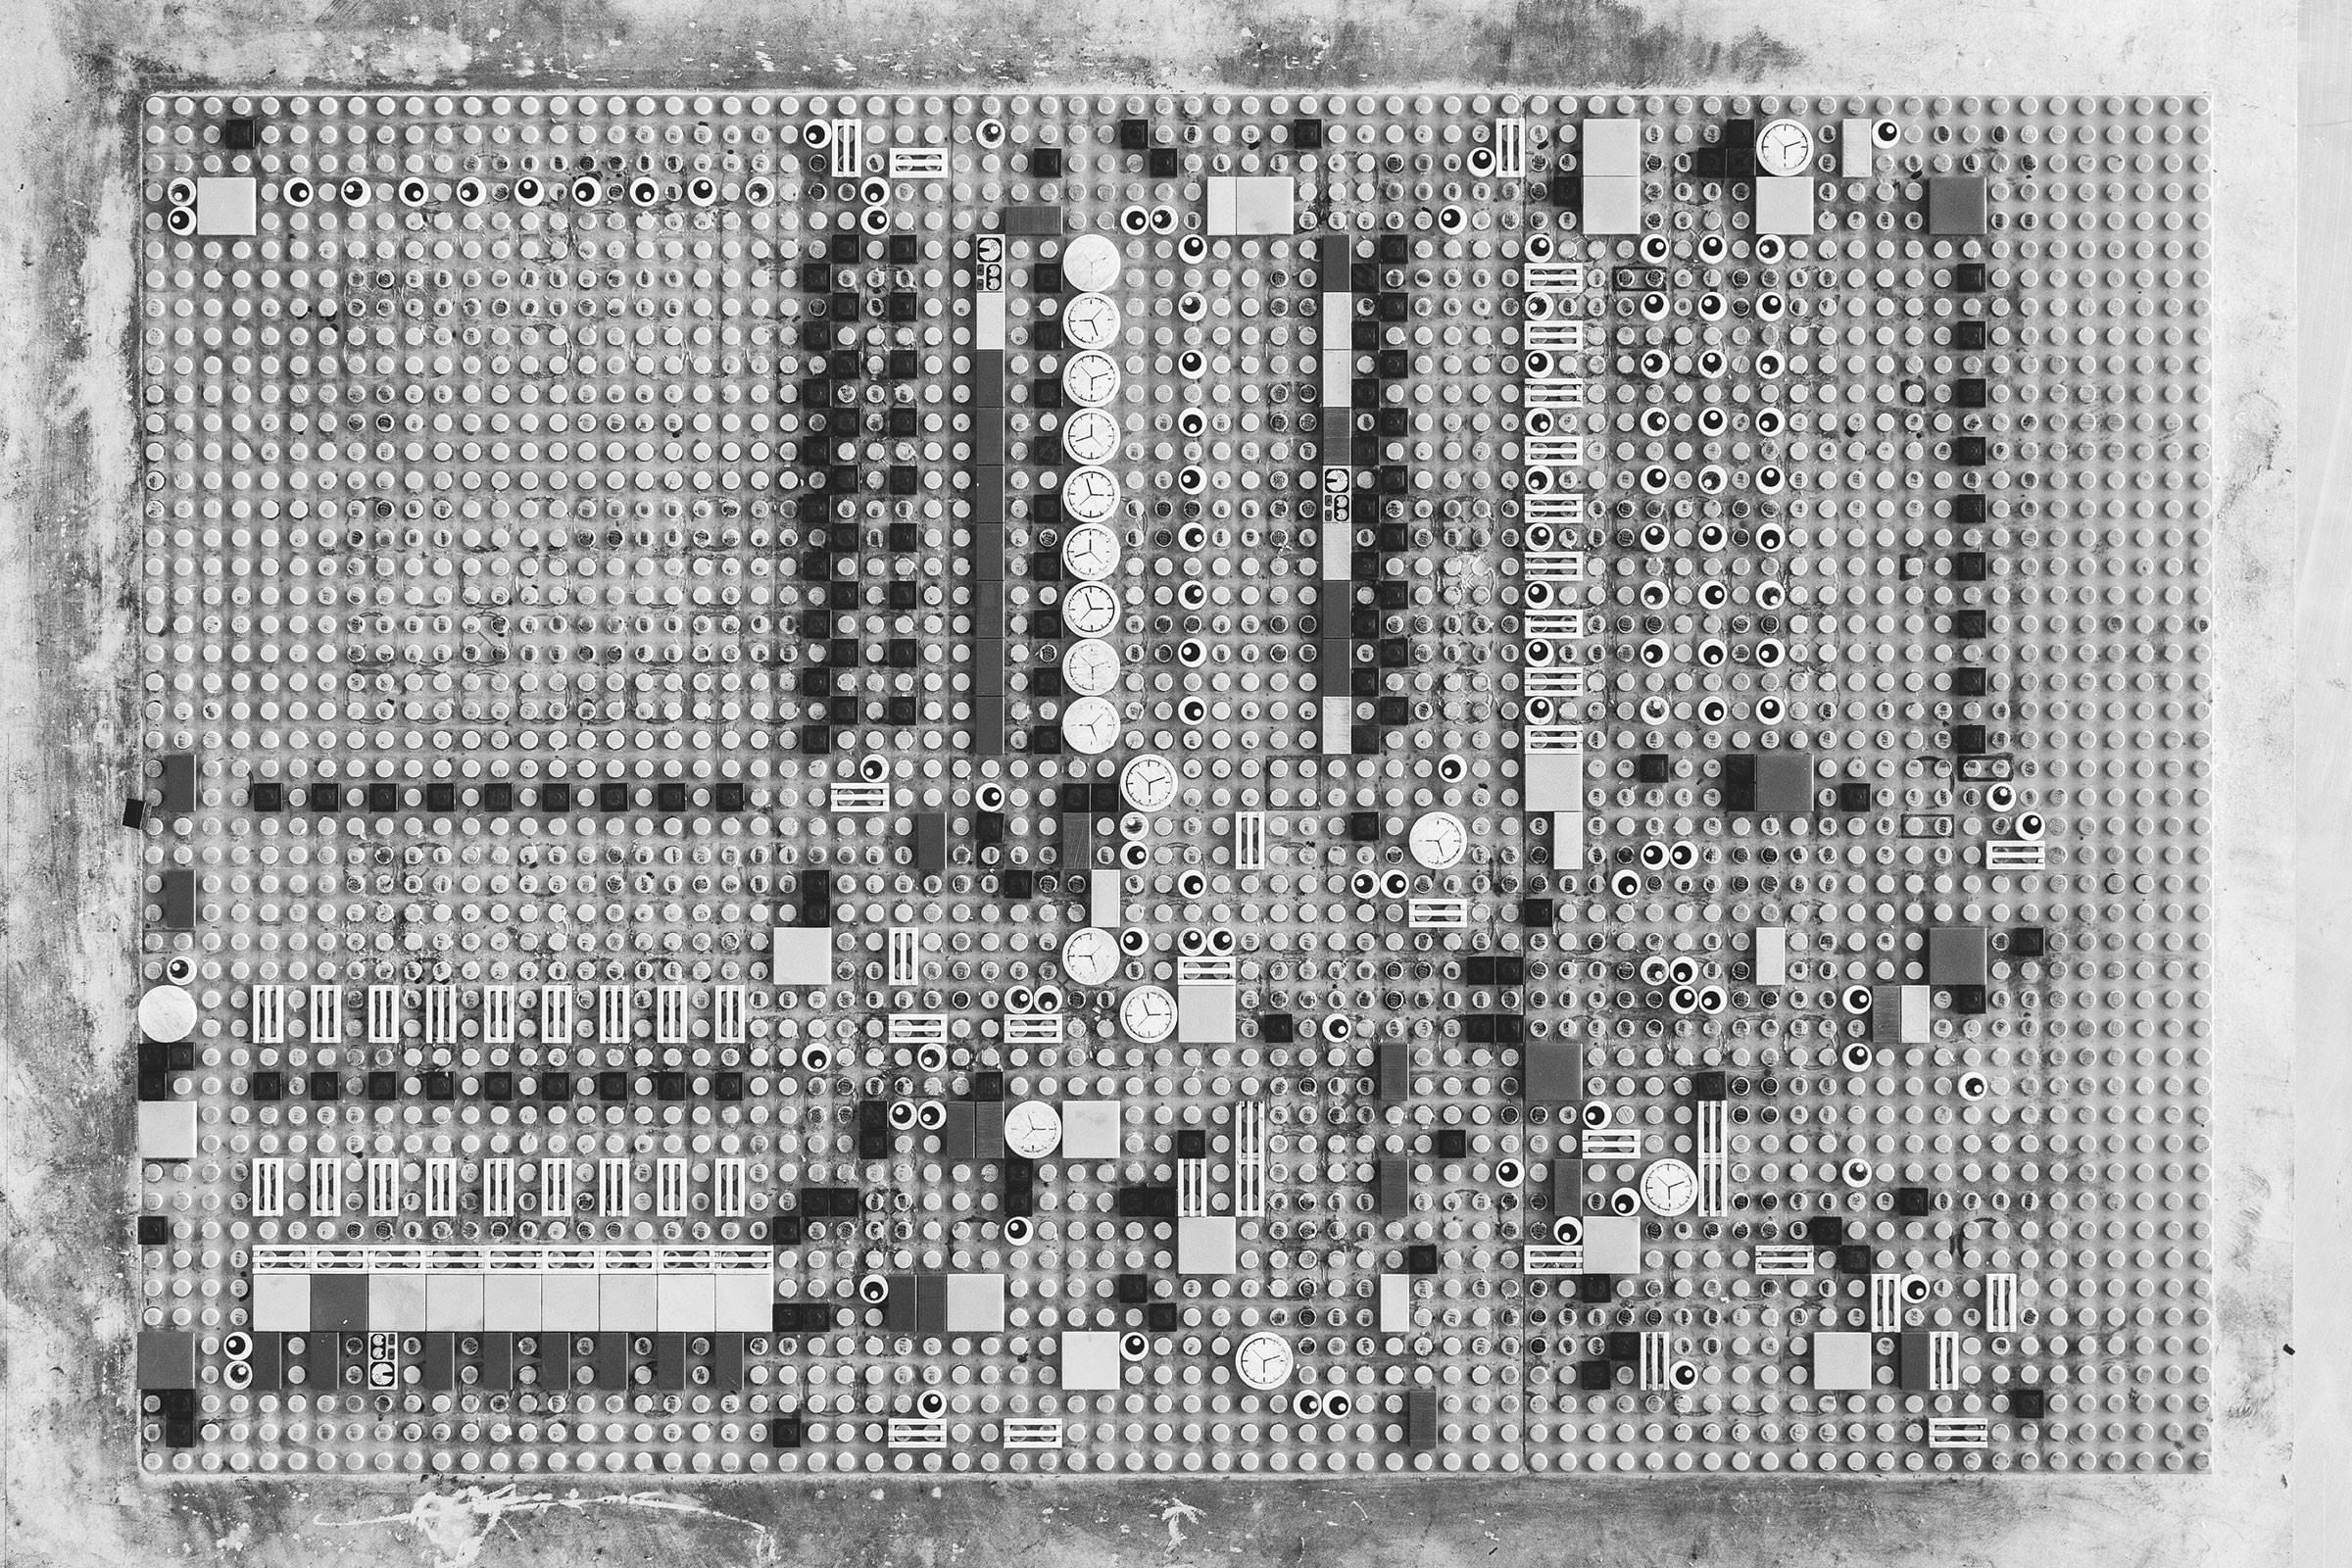 stellavie-letterpress-print-lego-glitch-A5cX-9379_2480x1640